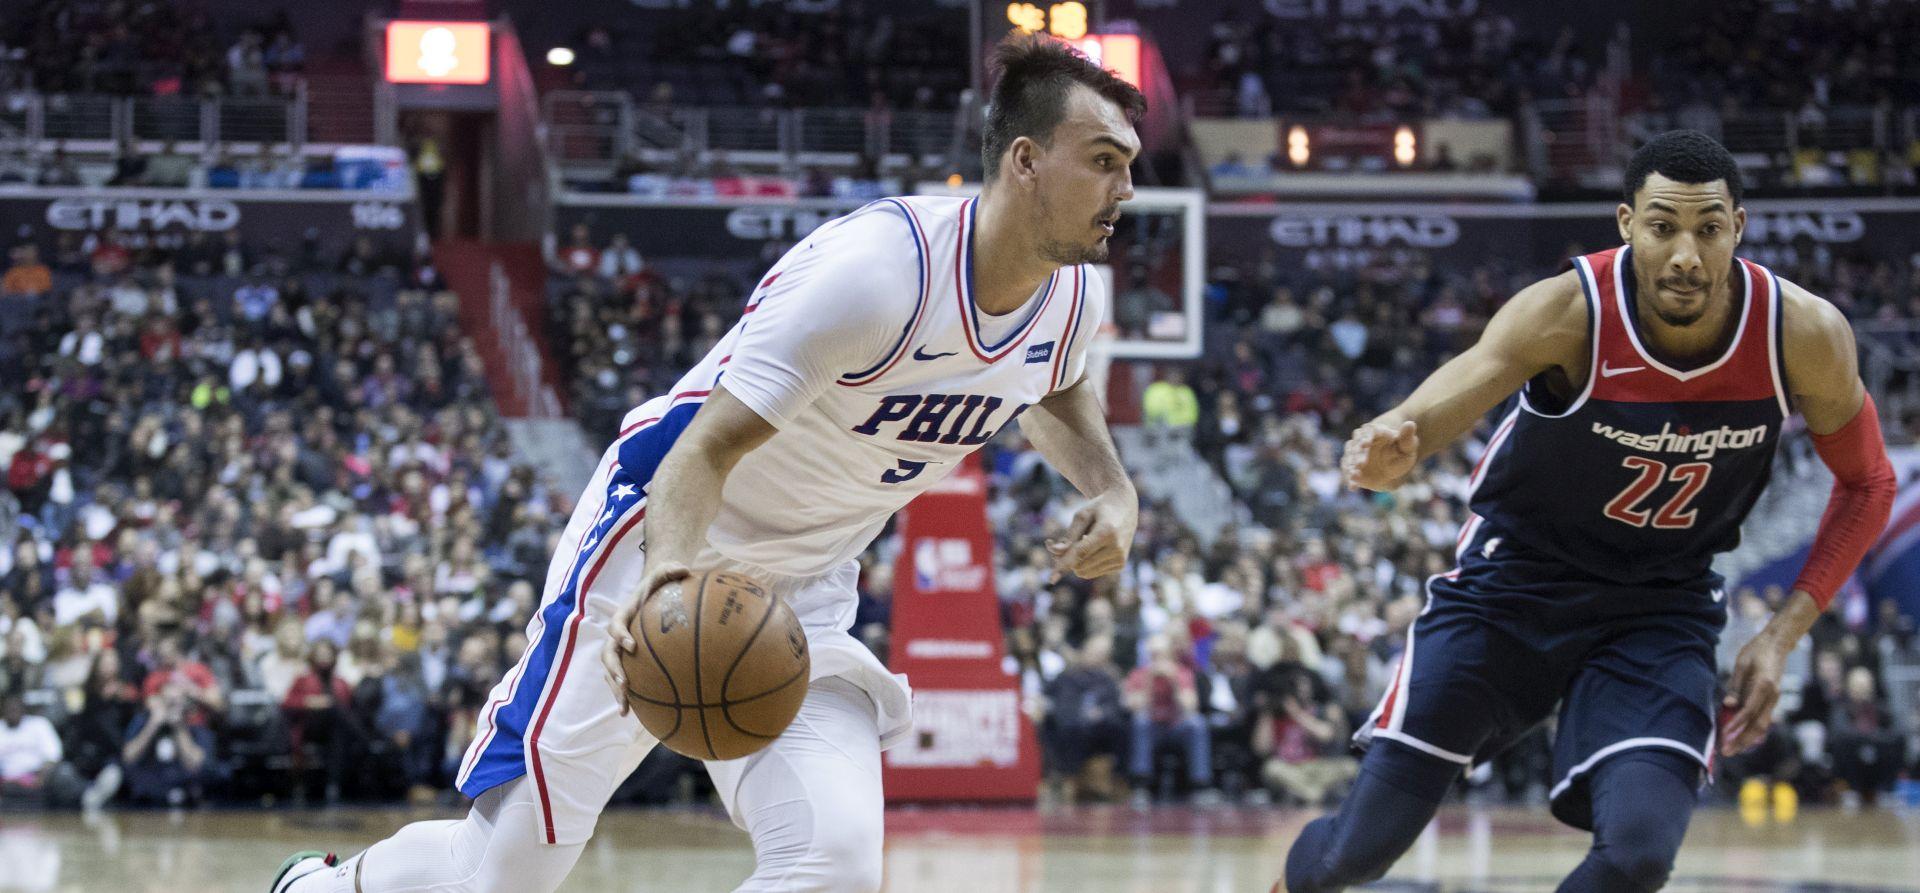 NBA Sixersi izgubili, Šarić ubacio 13